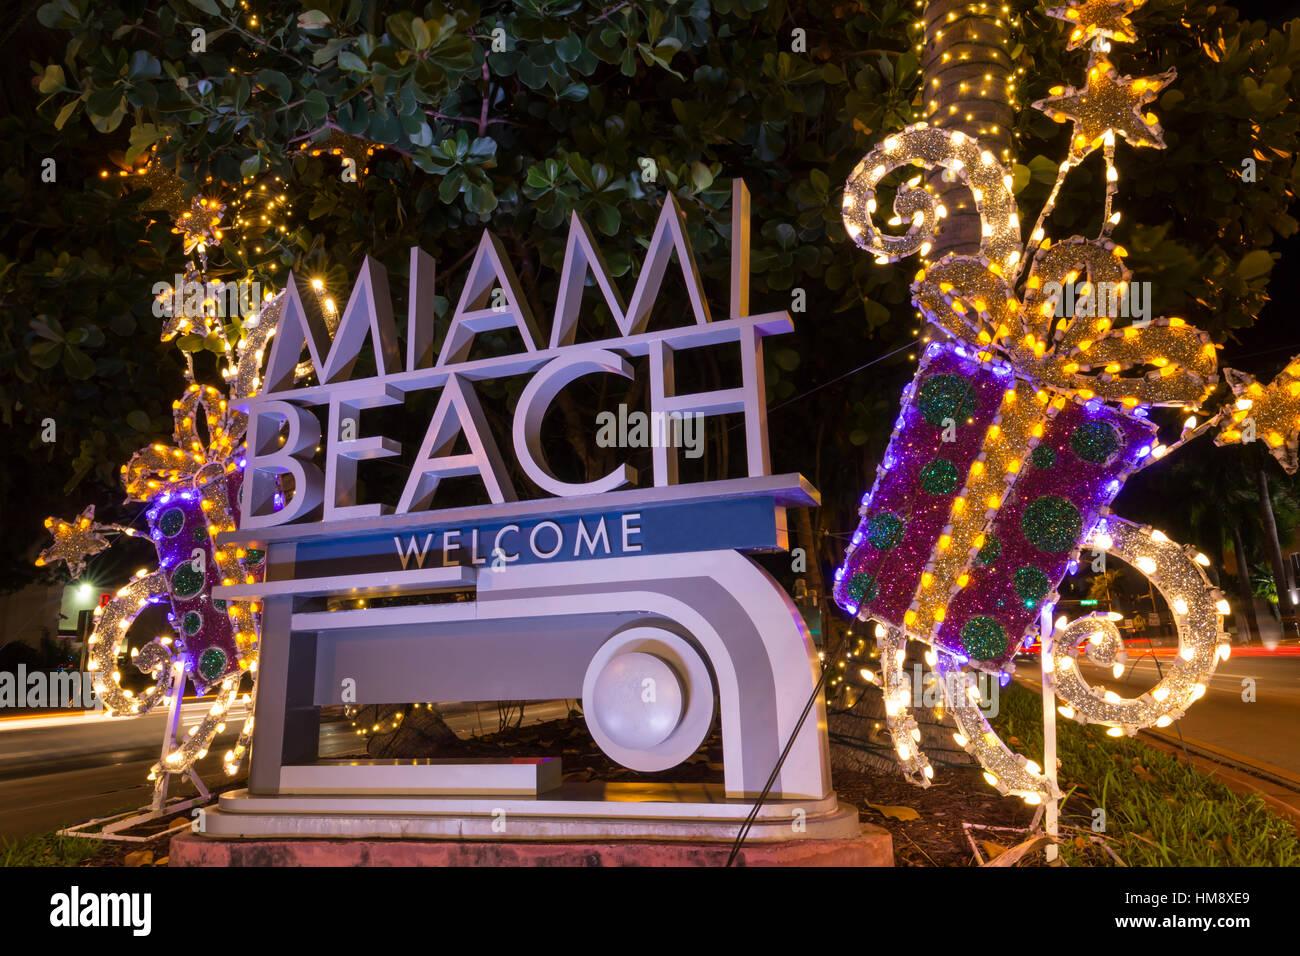 CHRISTMAS DECORATIONS ON WELCOME SIGN MIAMI BEACH FLORIDA USA Stock ...